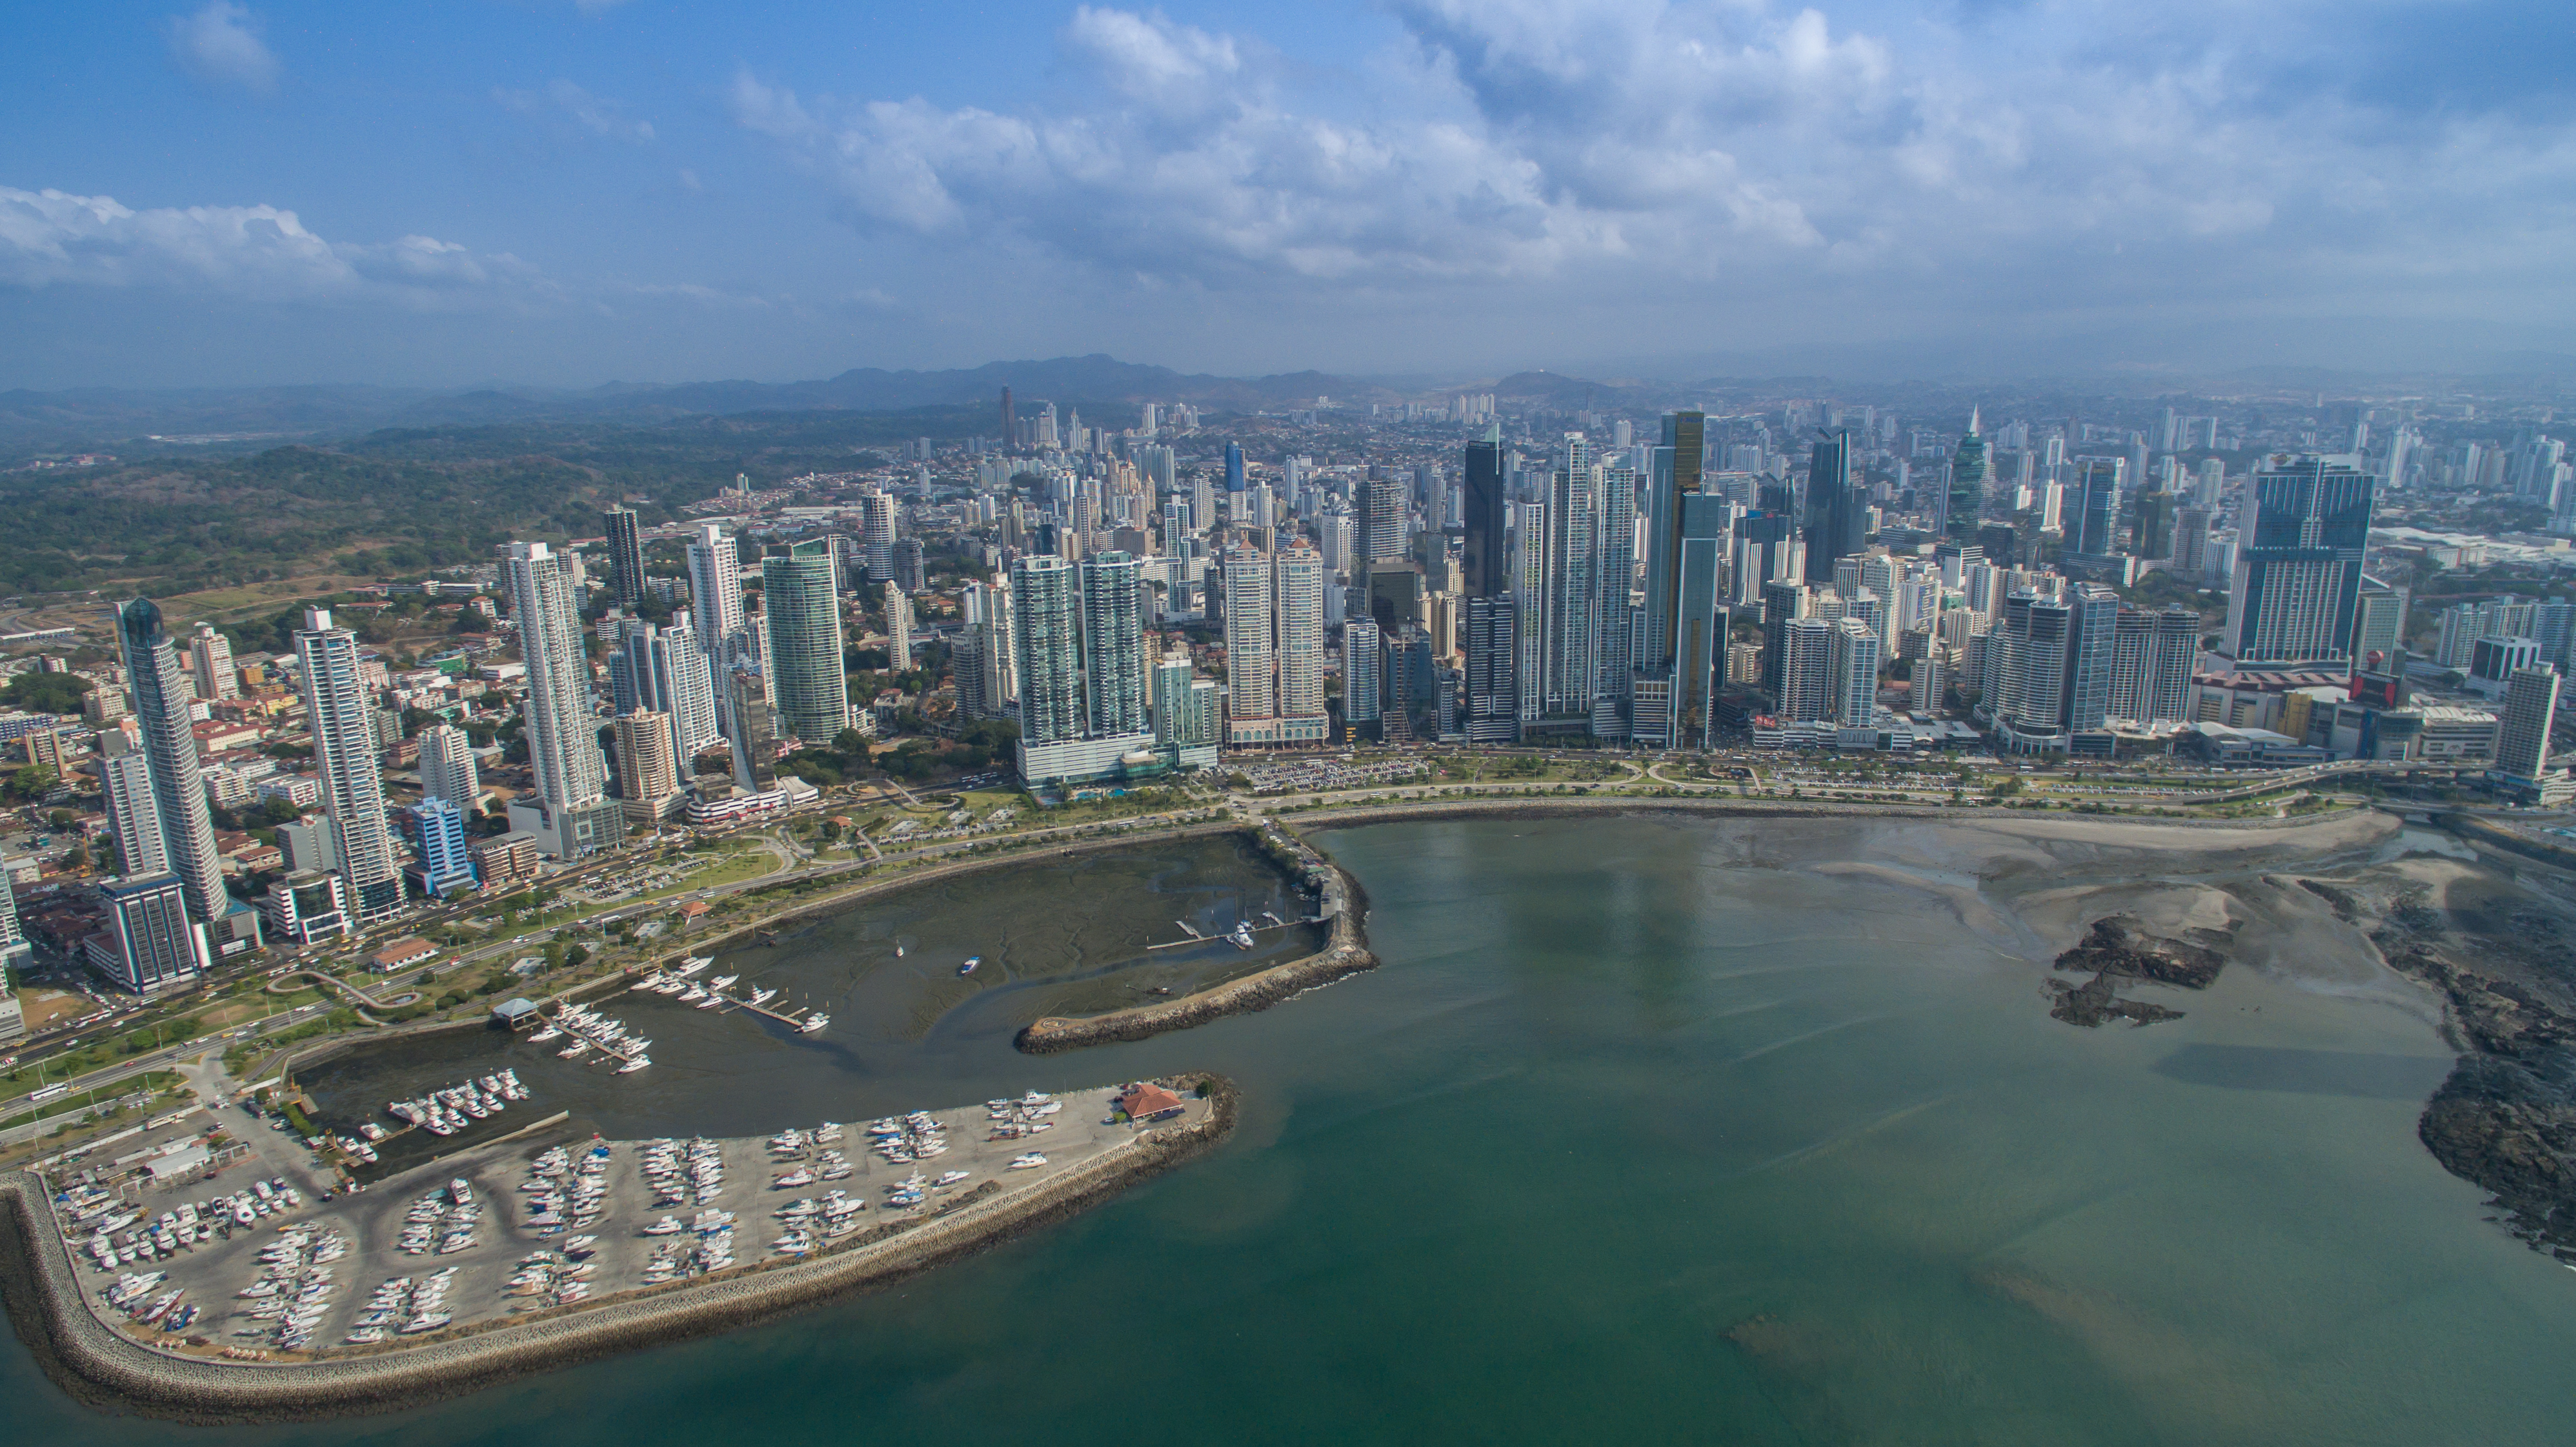 Cities Skyline How To Build Parking Lotsa